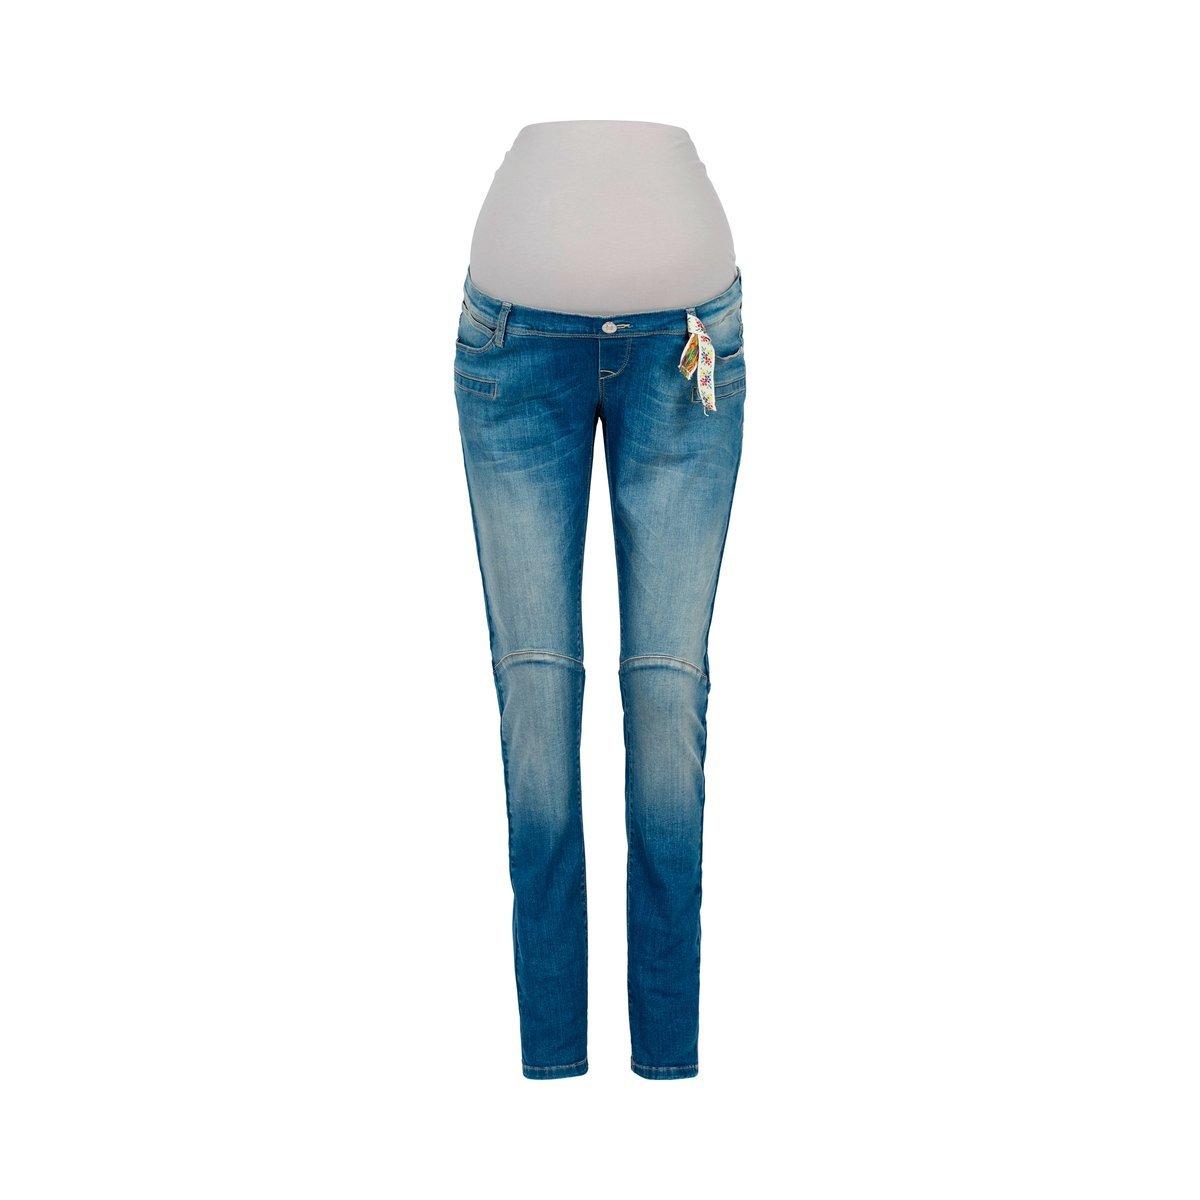 2HEARTS Umstands-Jeans Denim Blau/Umstandshose / Schwangerschaftshose/Umstandsmode / Jeans für Werdende Mamas